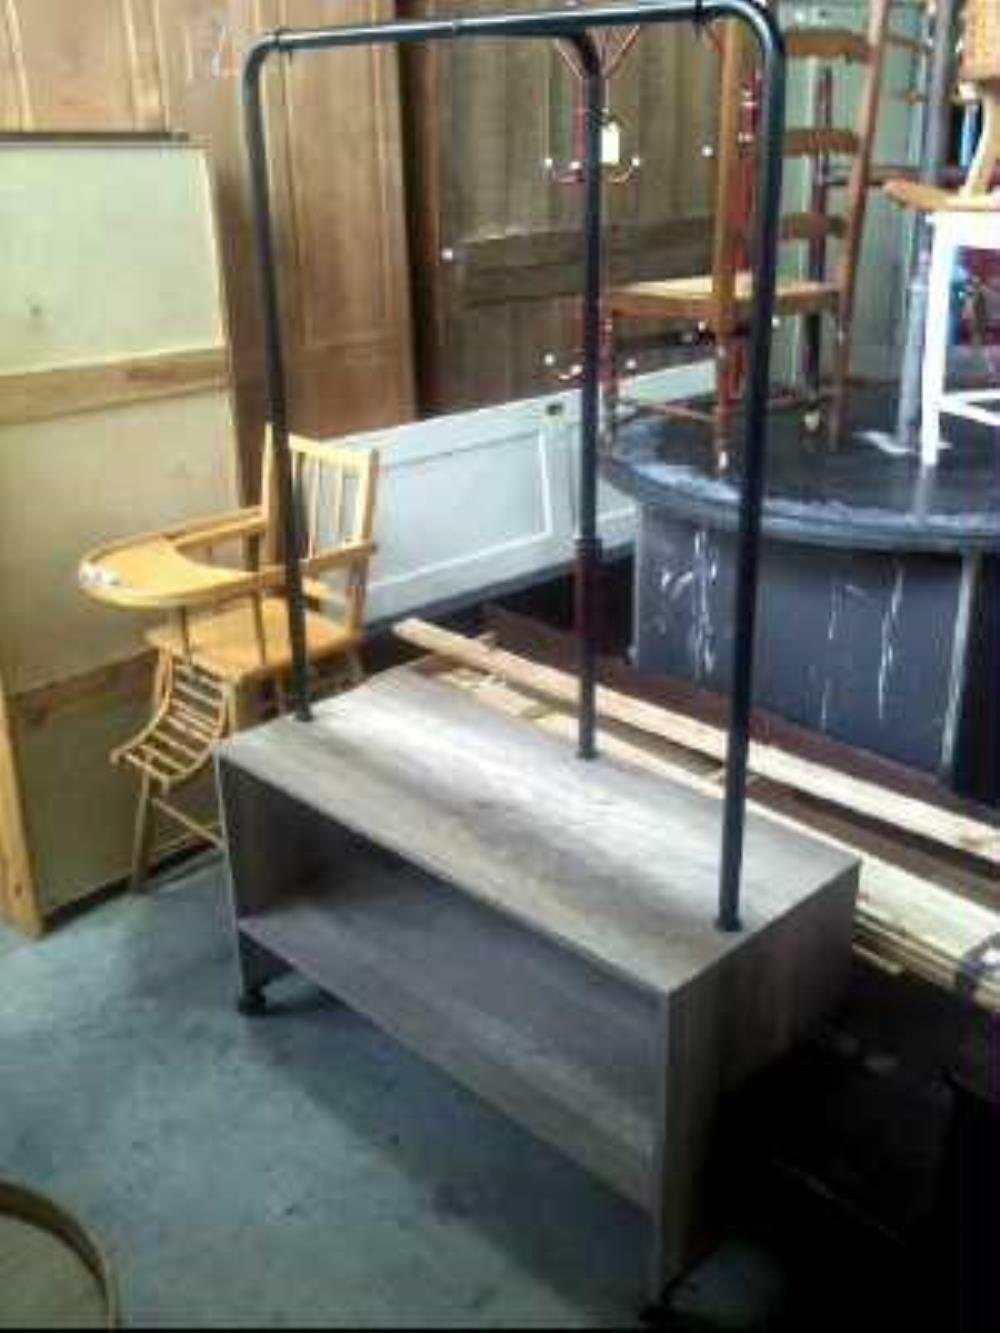 d p t vente meythet troc annecy. Black Bedroom Furniture Sets. Home Design Ideas